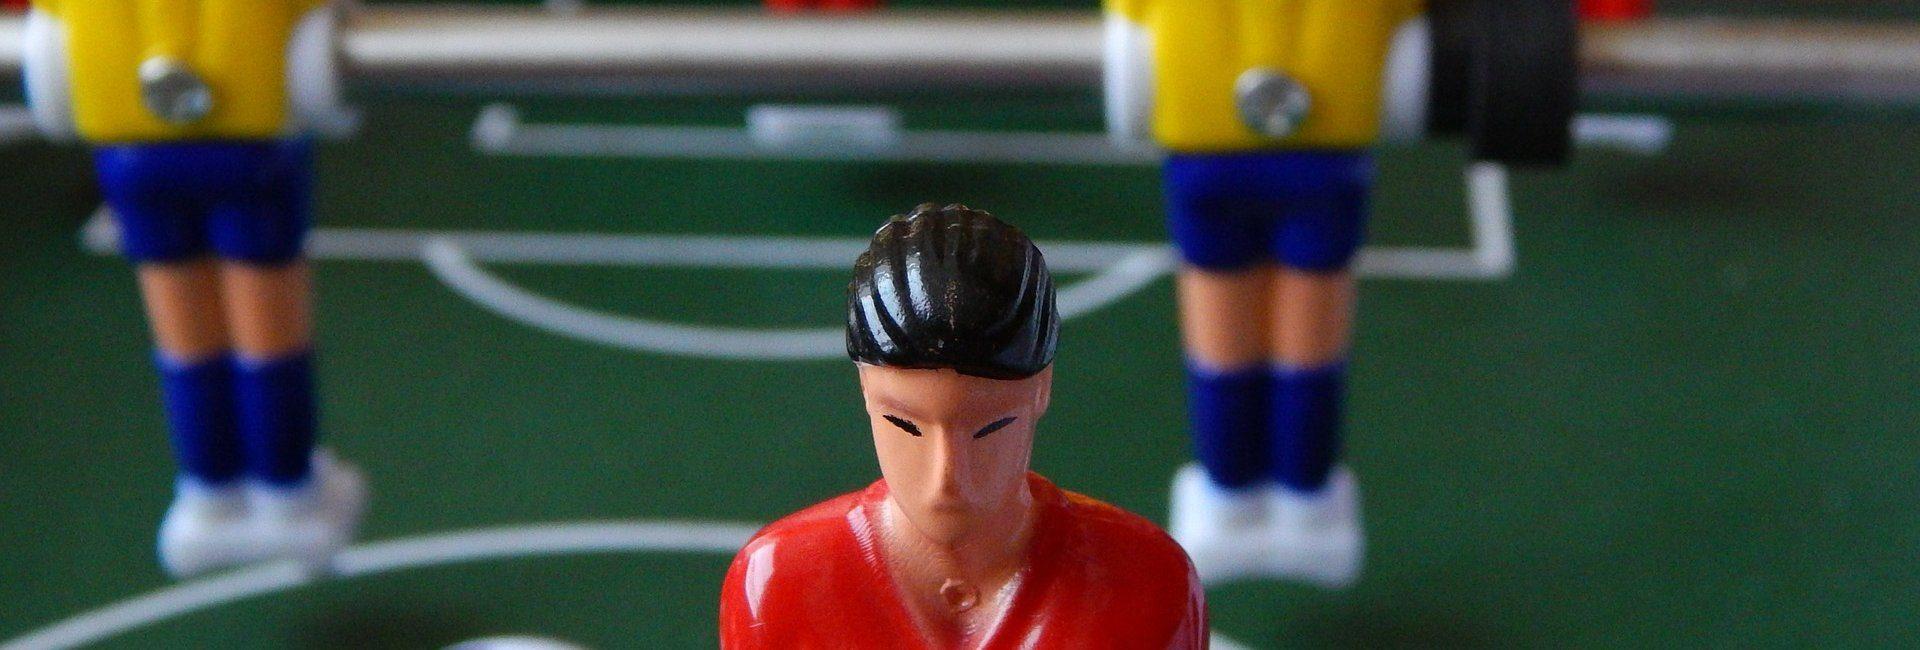 Table Football/Foosball